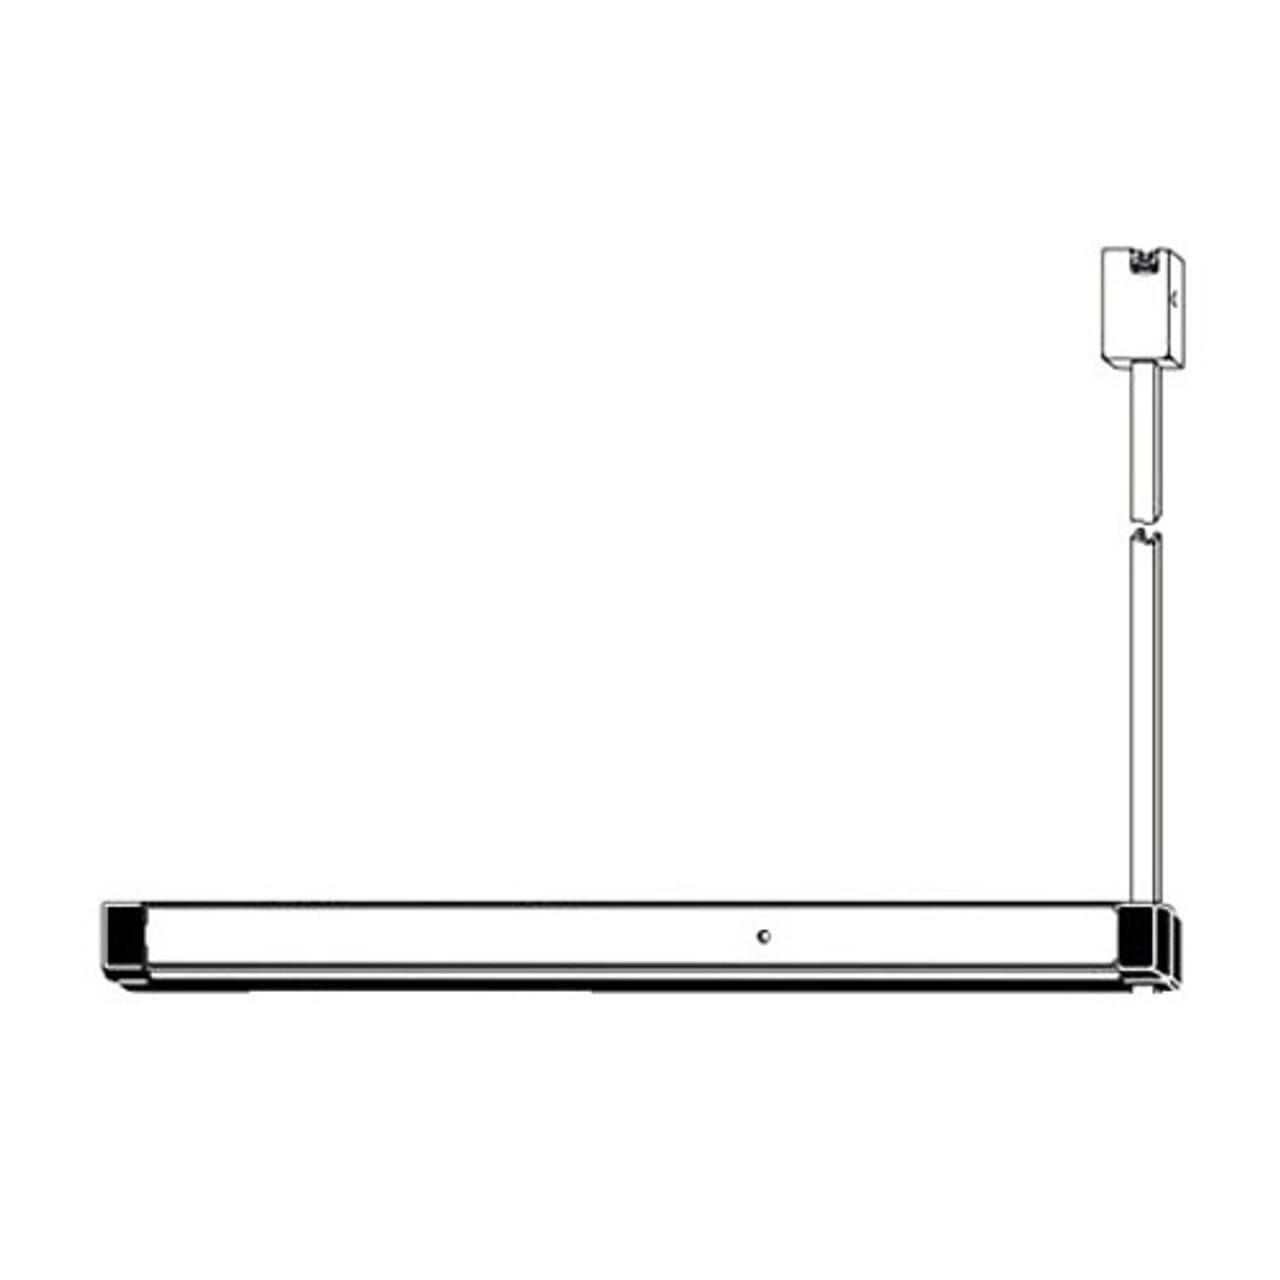 8222T-ED-42 Adams Rite Narrow Stile Surface Vertical Rod Exit Device in Dark Bronze